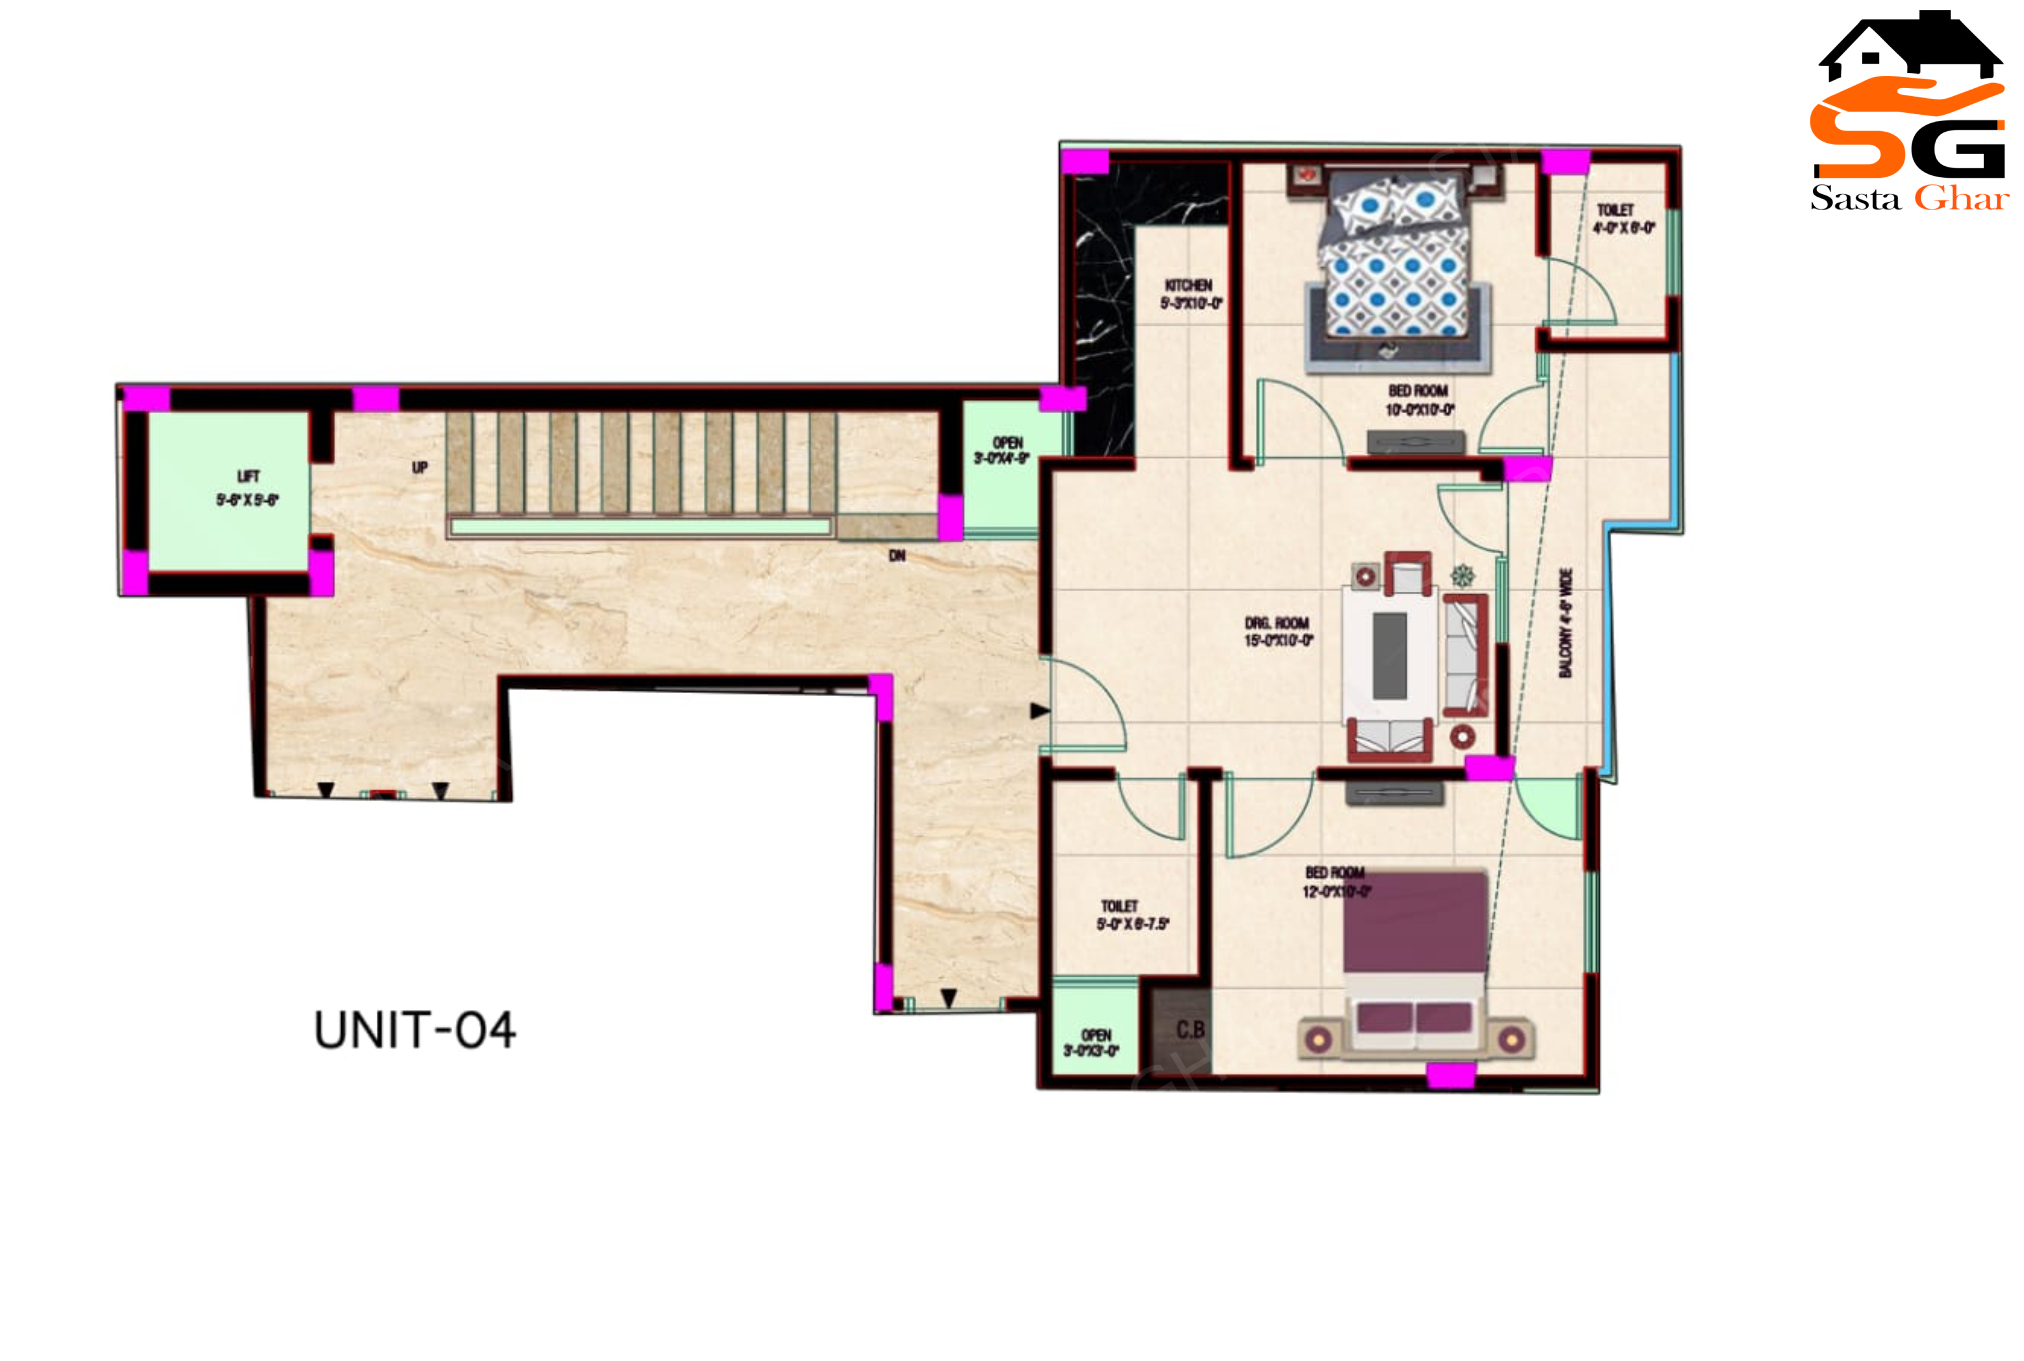 2 BHK Flat Jonapur Image